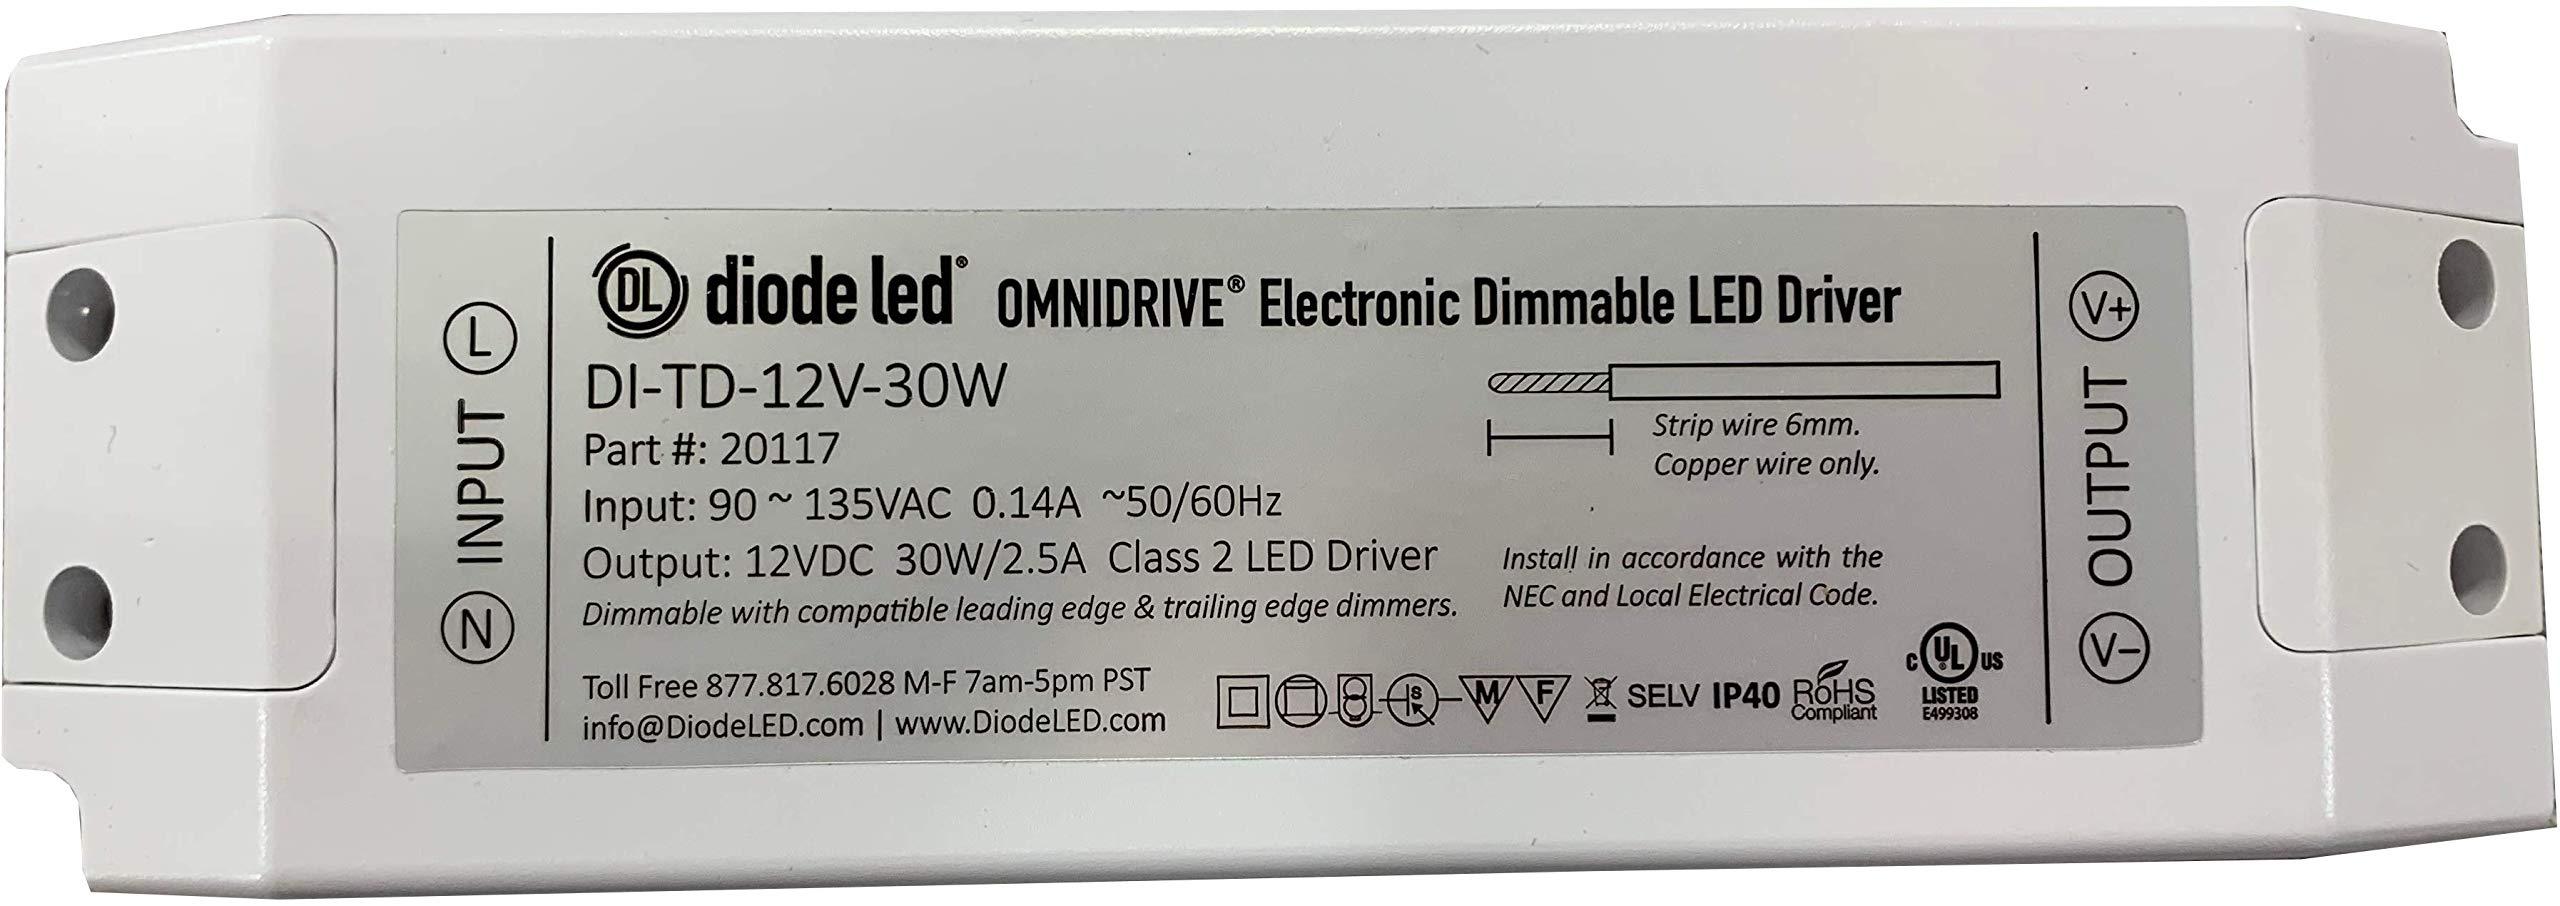 Diode LED DI-TD-12V-30W 30 Watt Omnidrive Electronic Dimmable LED Driver 12V DC